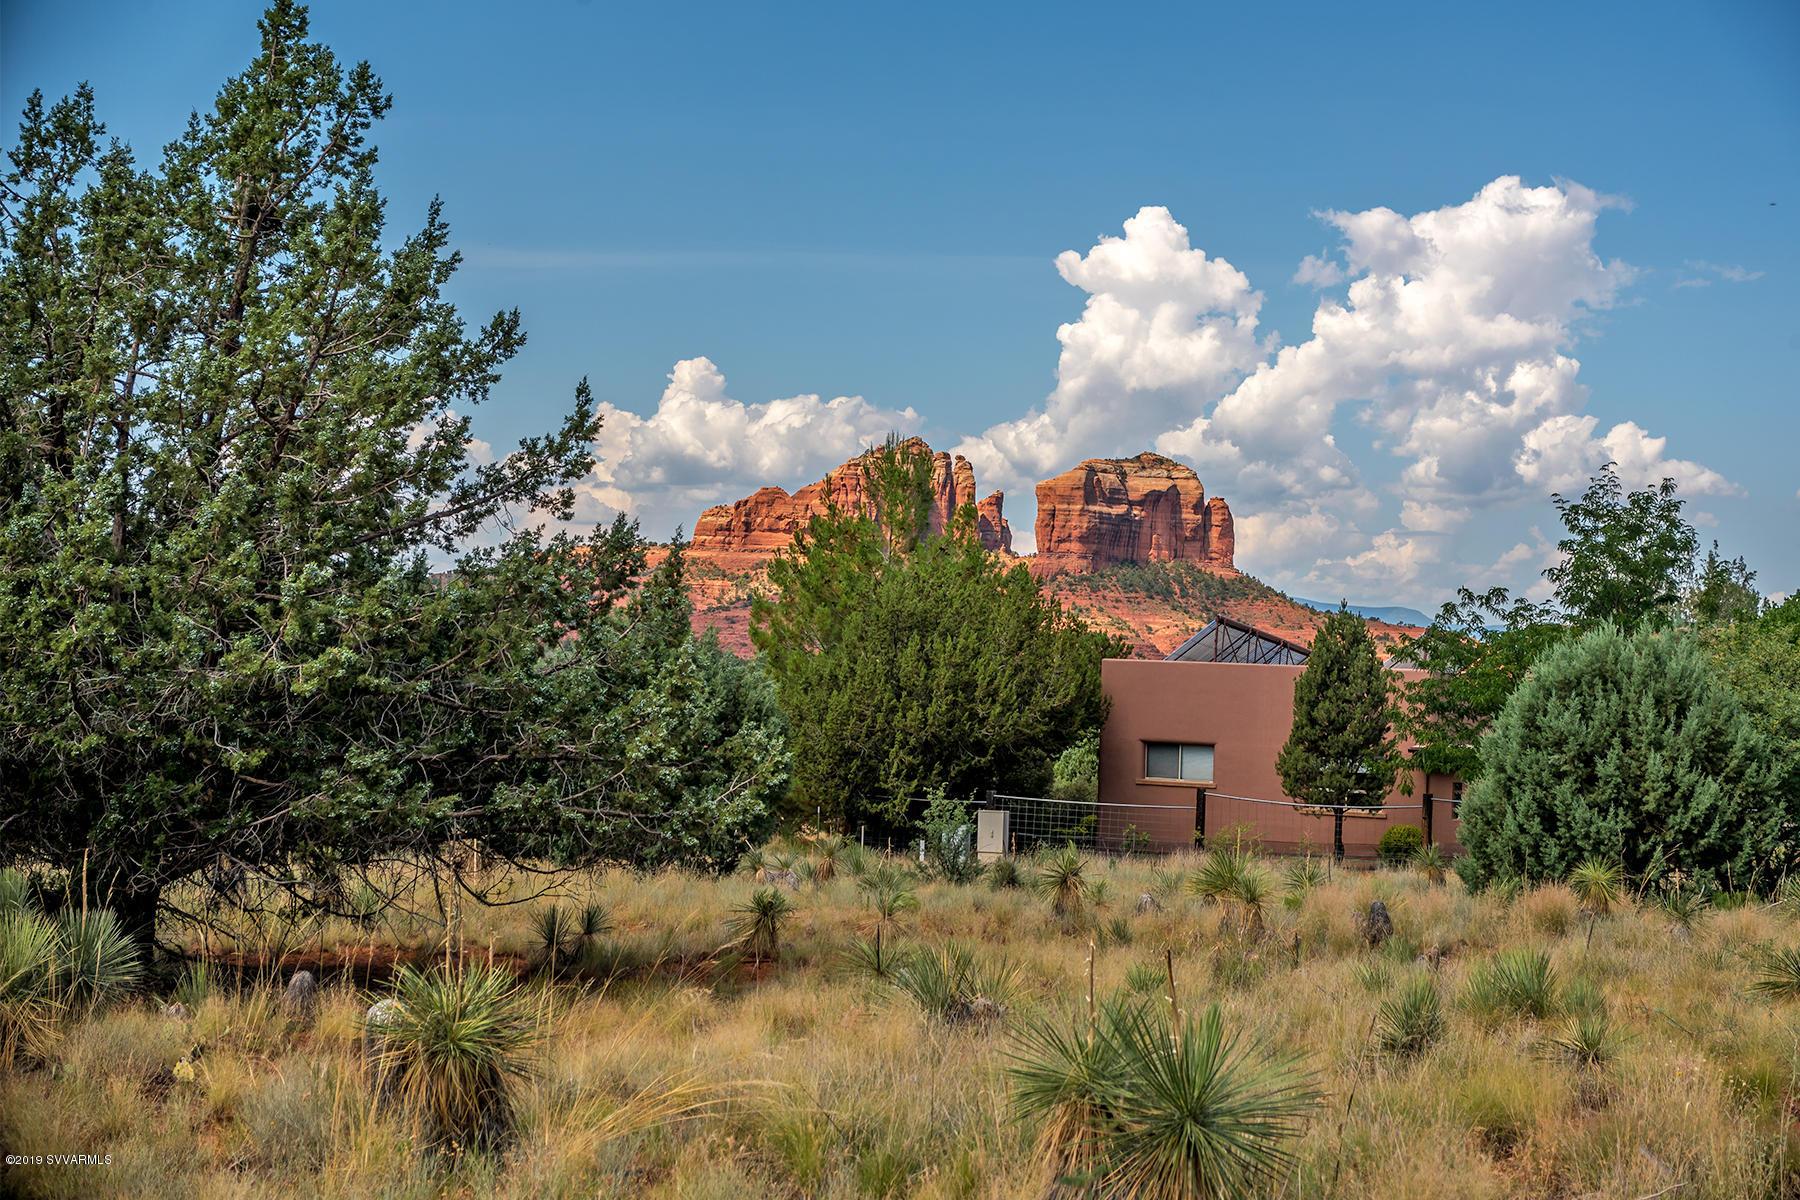 70 Panorama Sedona, AZ 86336